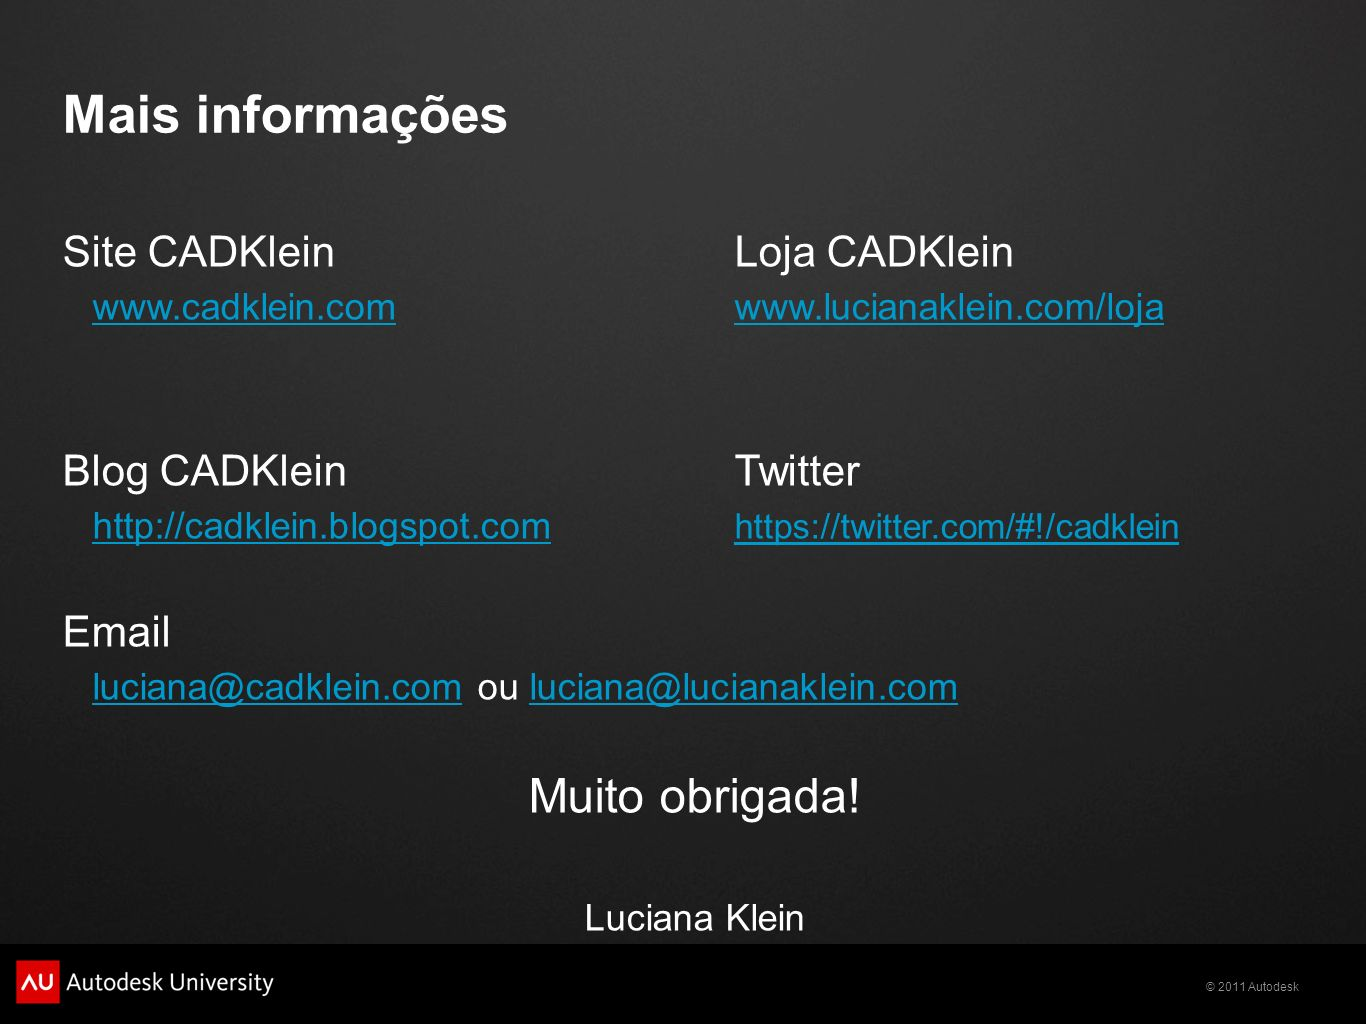 © 2011 Autodesk Mais informações Site CADKleinLoja CADKlein www.cadklein.comwww.cadklein.com www.lucianaklein.com/lojawww.lucianaklein.com/loja Blog CADKleinTwitter http://cadklein.blogspot.comhttp://cadklein.blogspot.com https://twitter.com/#!/cadklein https://twitter.com/#!/cadklein Email luciana@cadklein.comluciana@cadklein.com ou luciana@lucianaklein.comluciana@lucianaklein.com Muito obrigada.